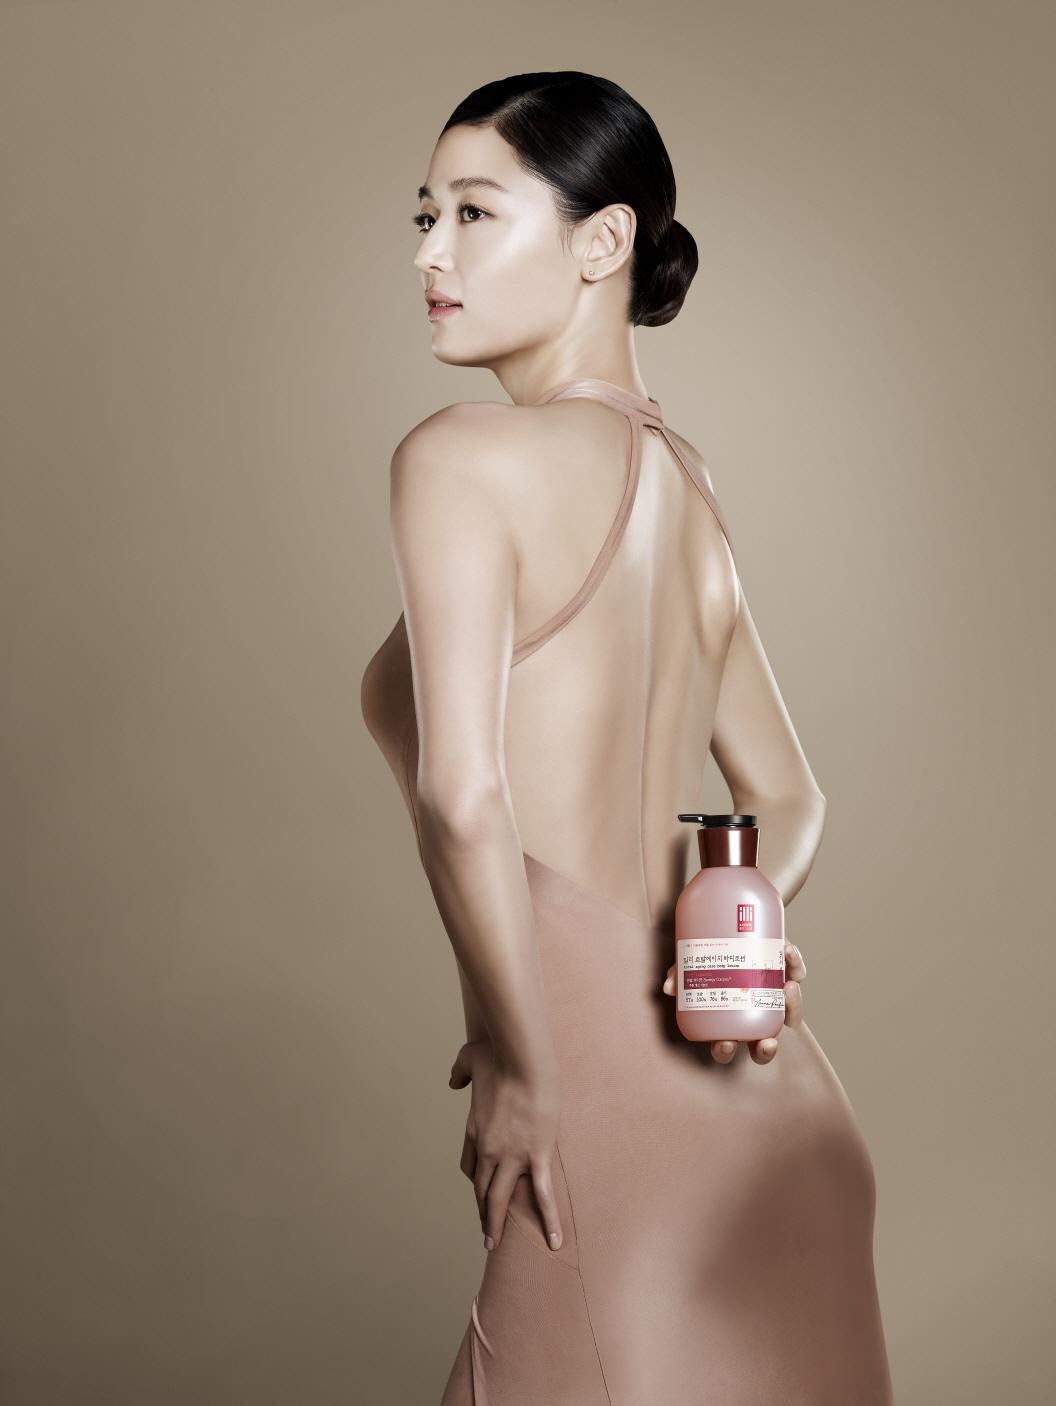 Jeon ji hyun sexy tea